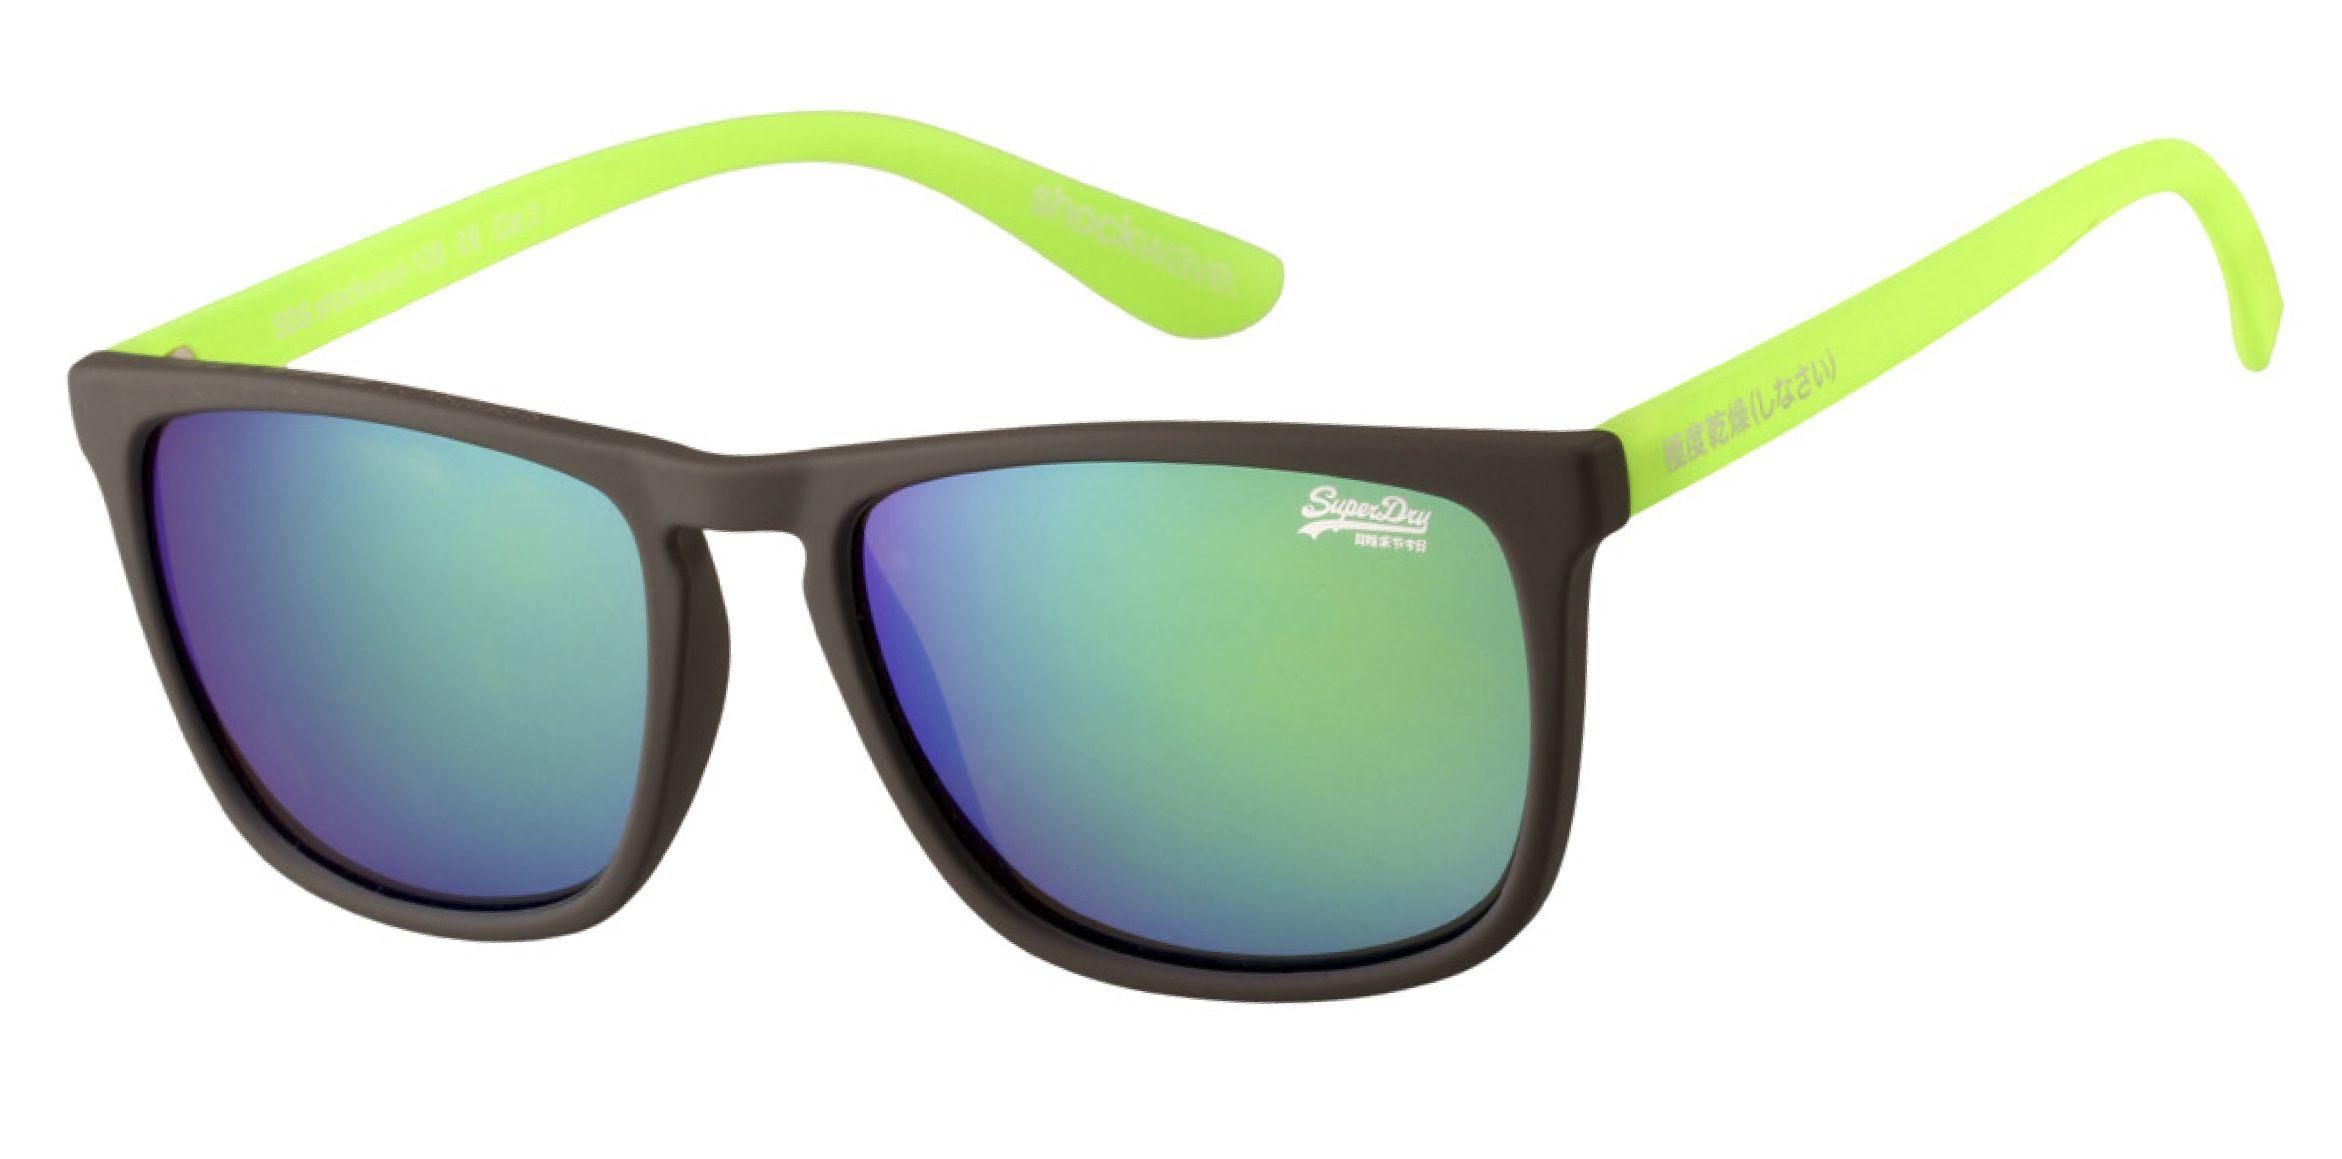 a55501d7e Superdry Shockwave sunglasses | glasses | Optical frames, Sunglasses ...